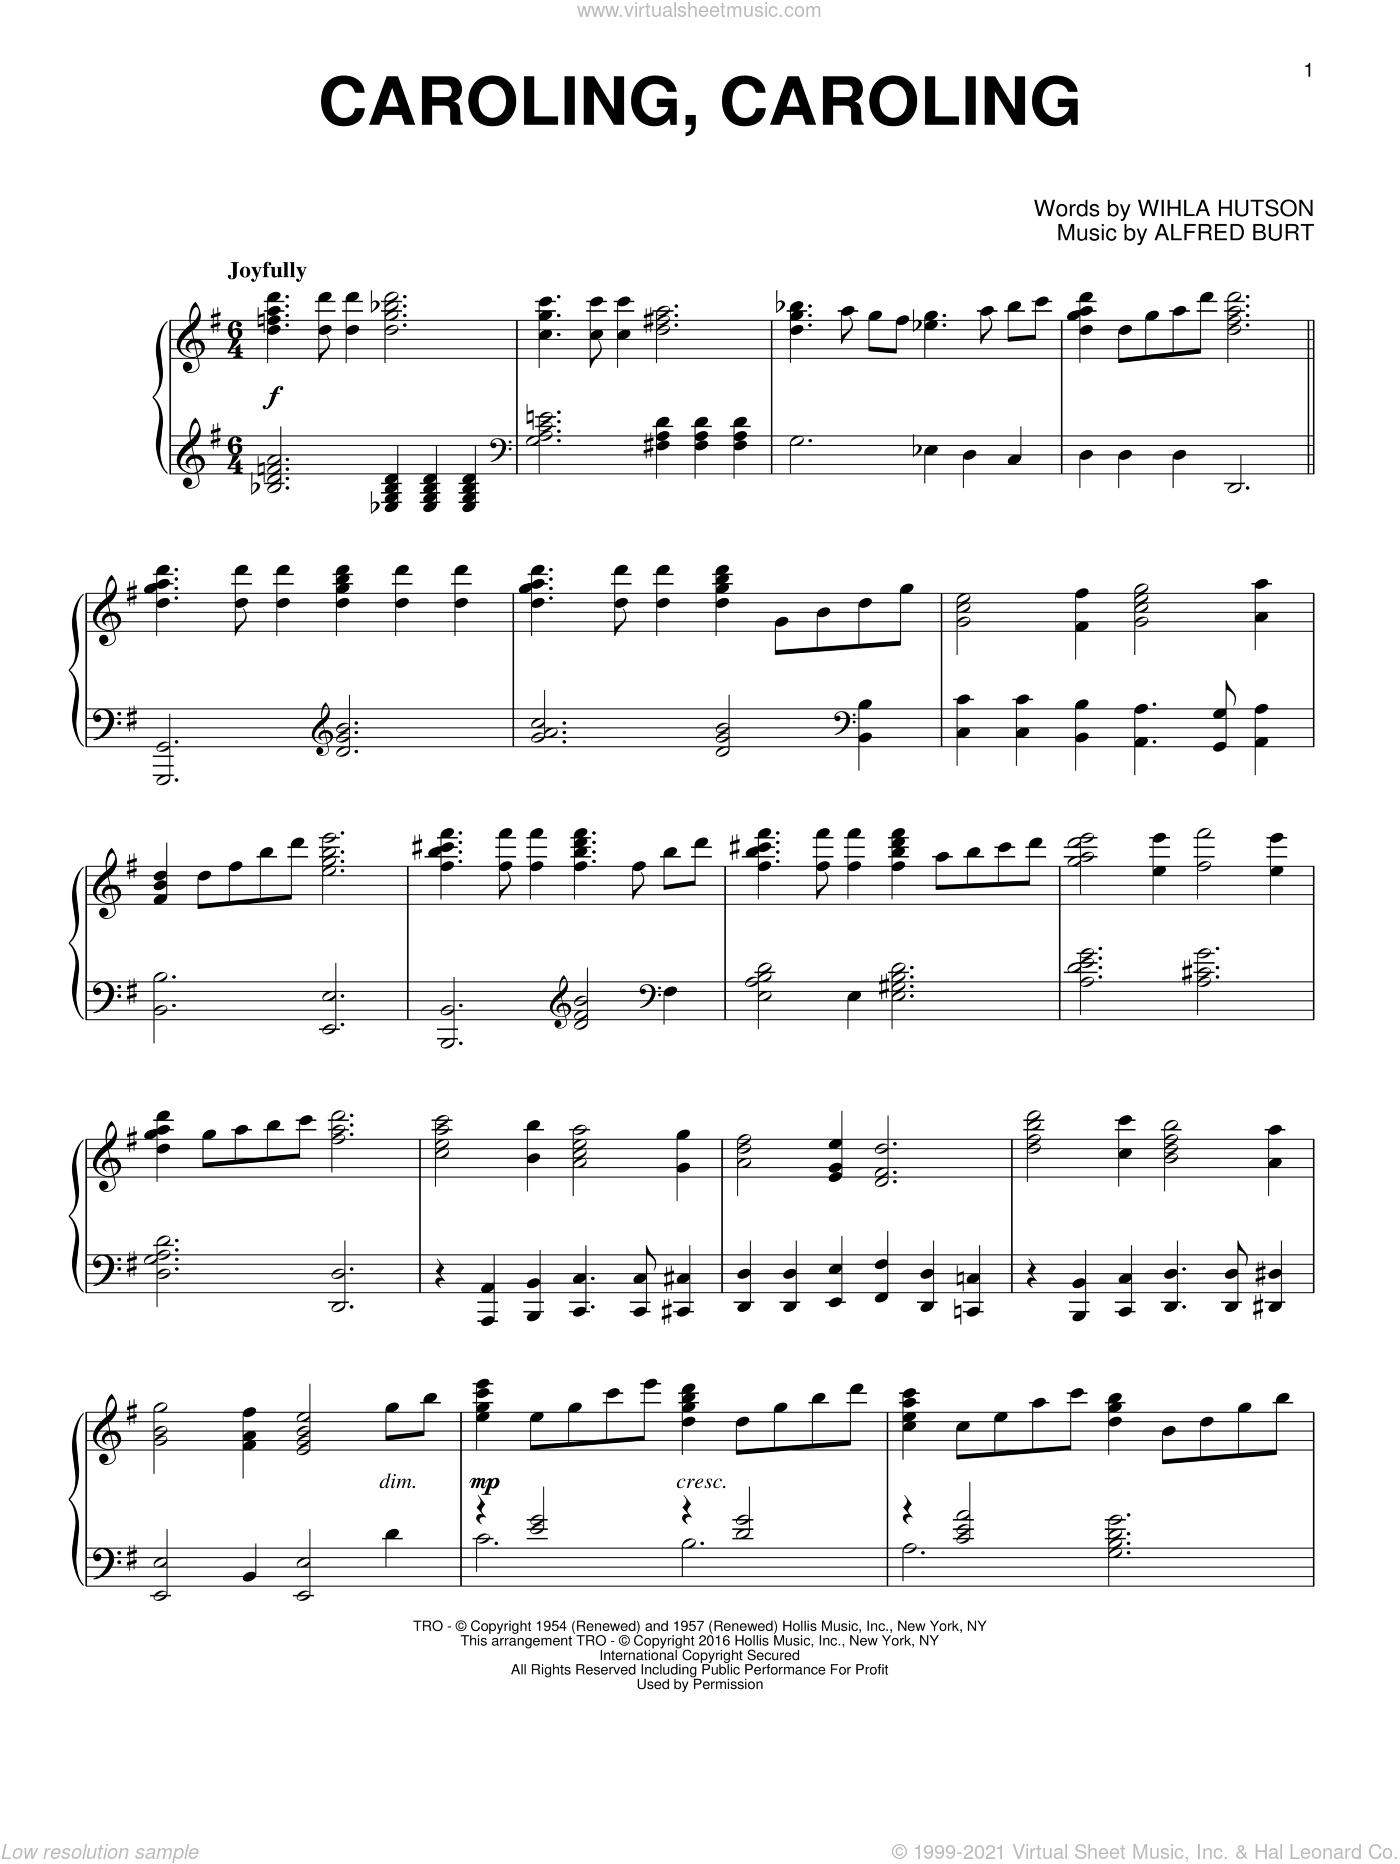 Caroling, Caroling sheet music for piano solo by Alfred Burt and Wihla Hutson, intermediate skill level